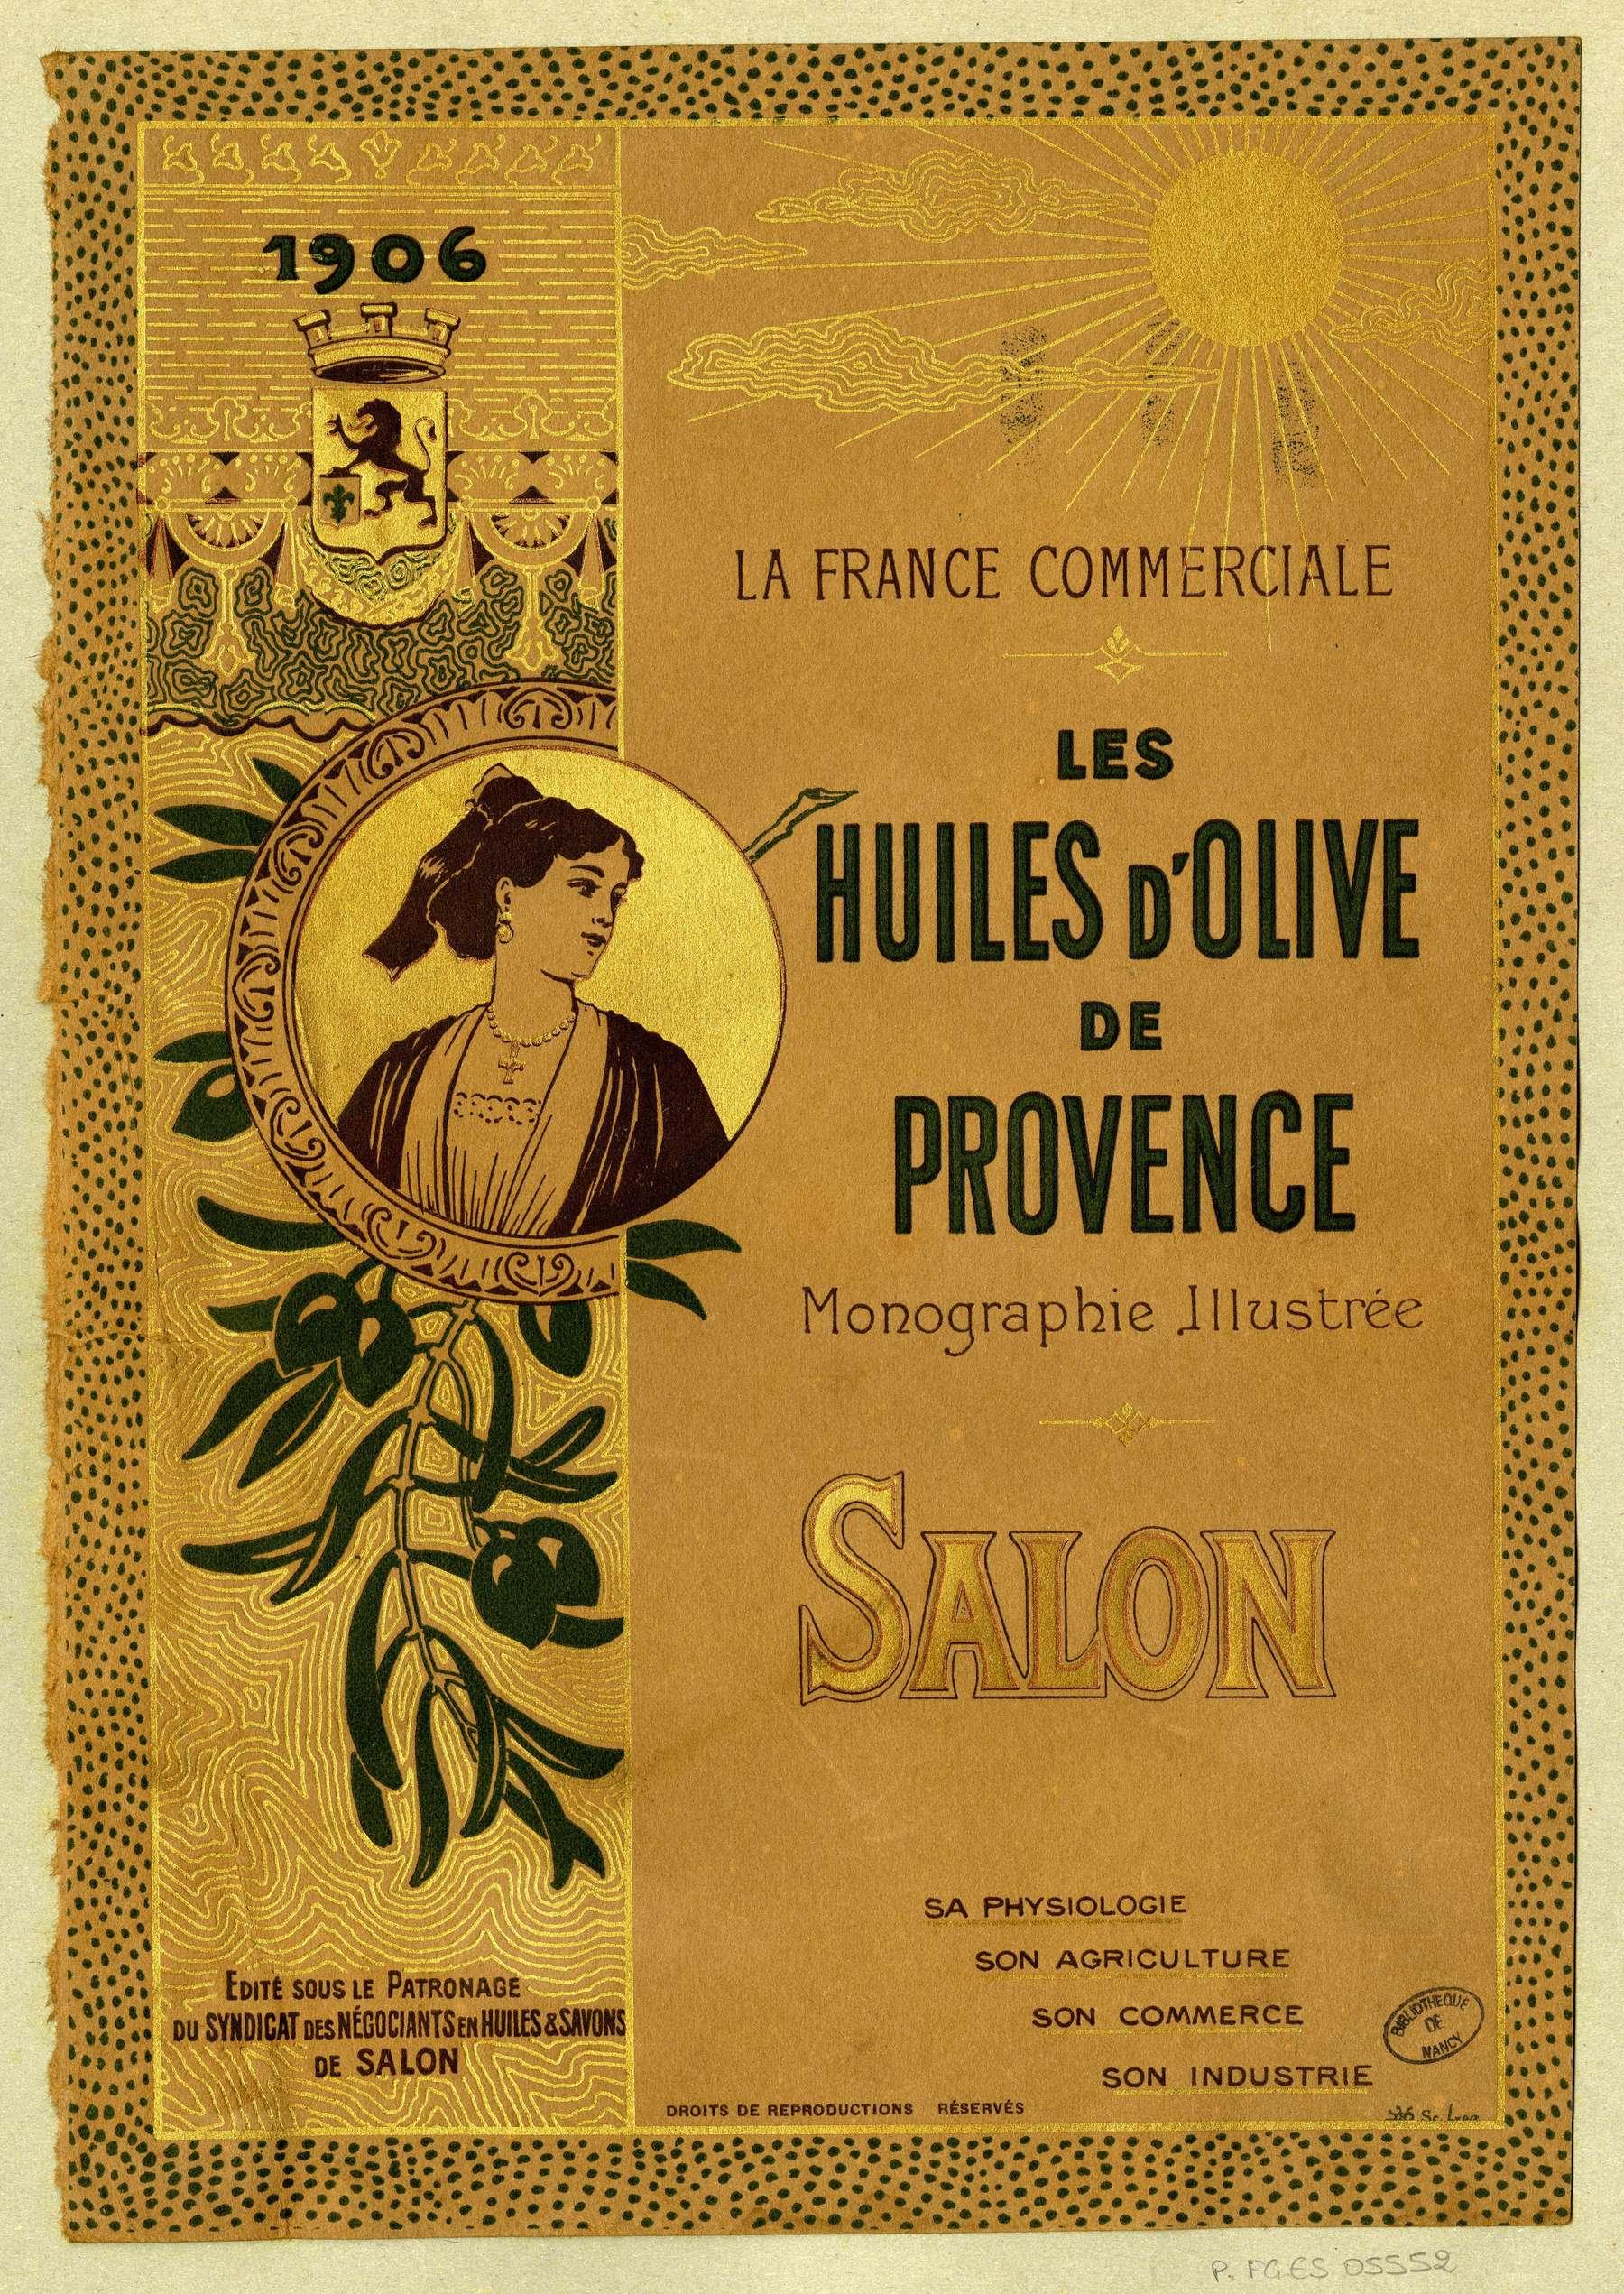 Contenu du Les huiles d'olive de Provence